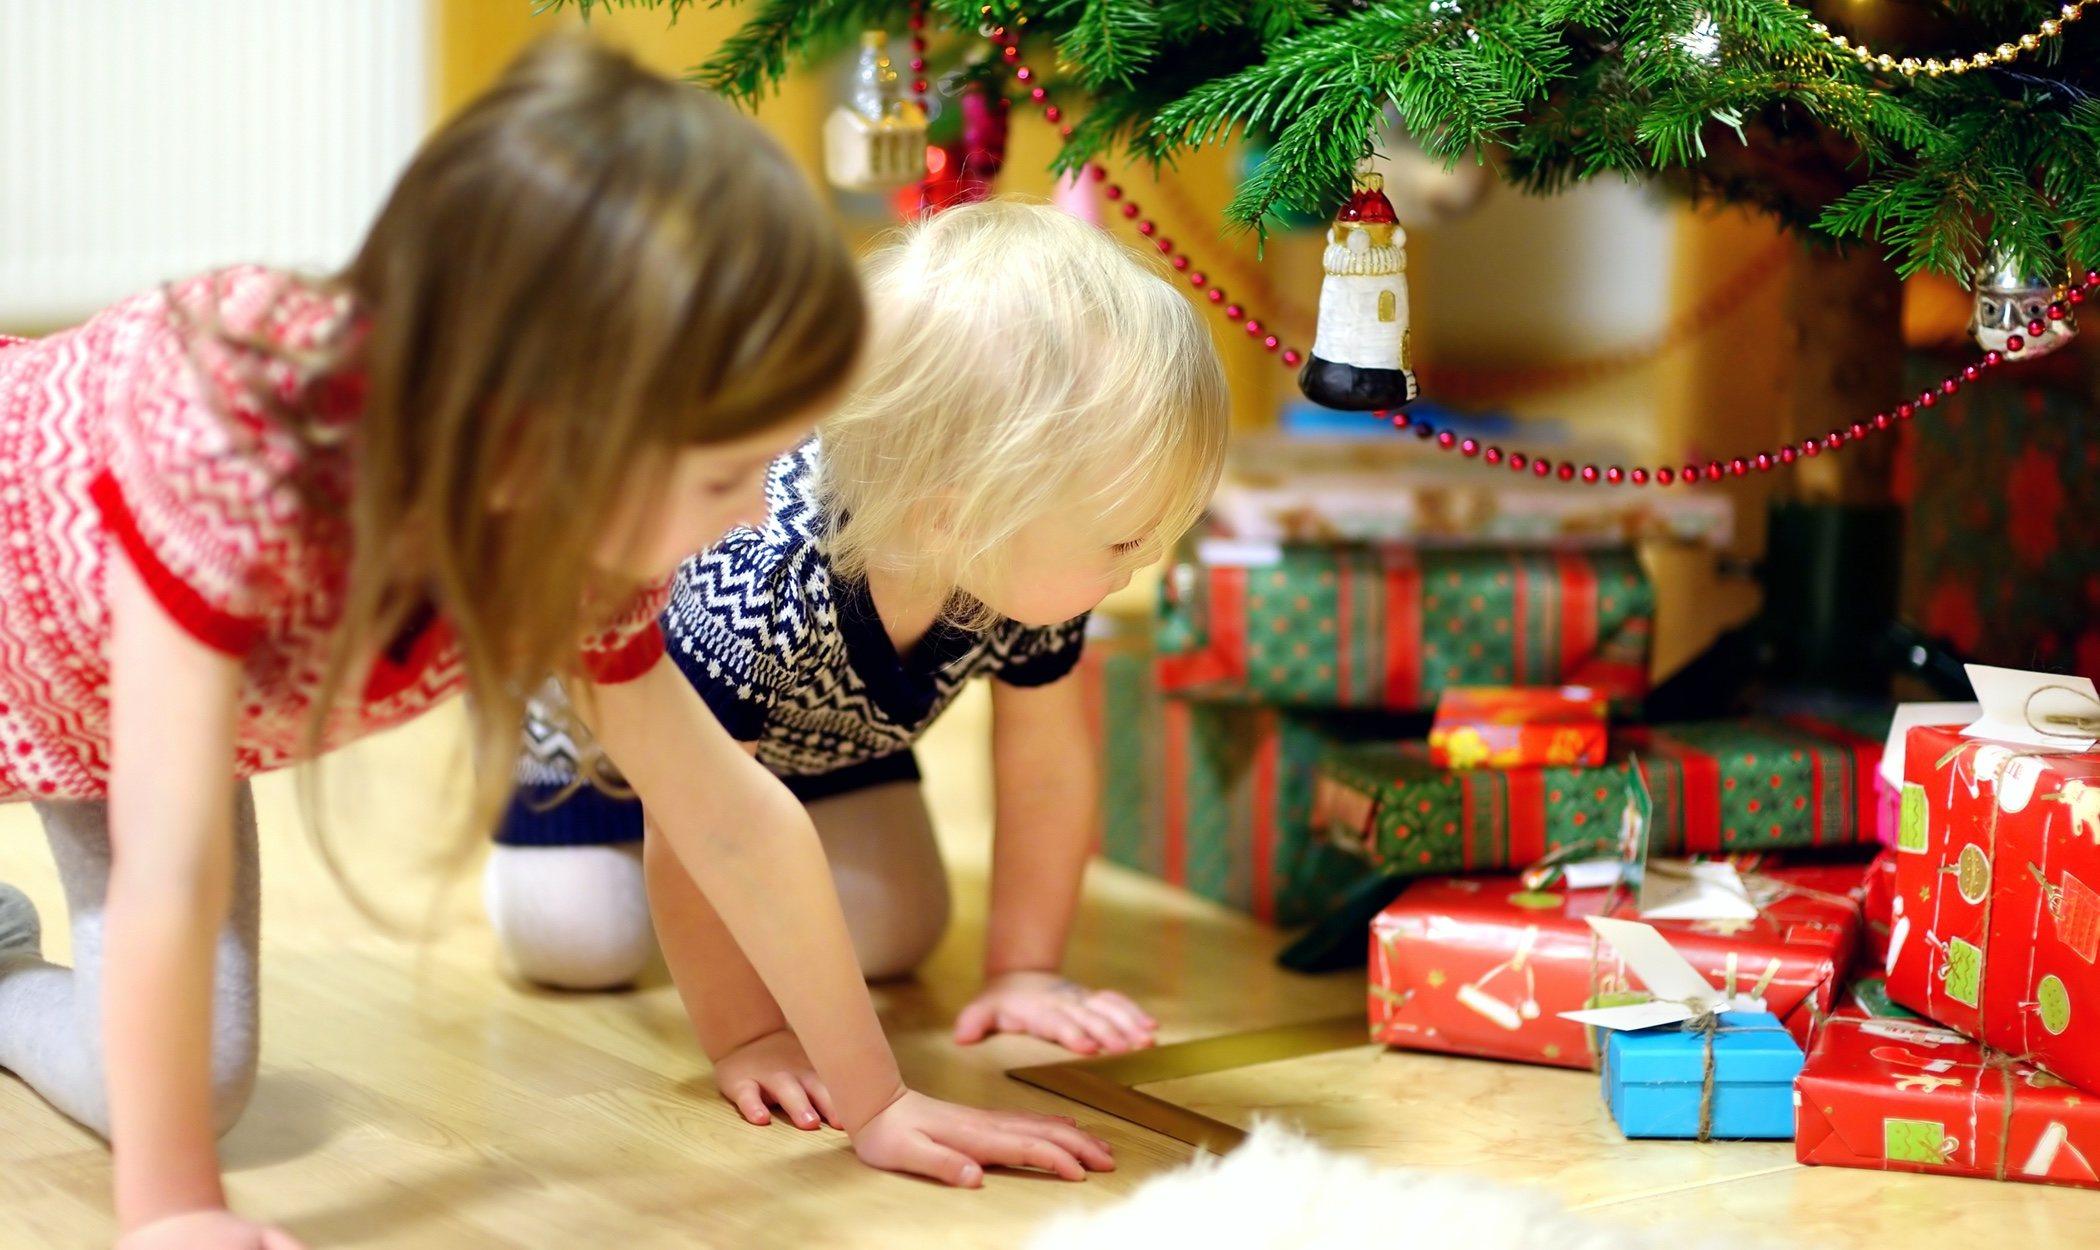 Conoce a L'Anguleru, el Papá Noel asturiano